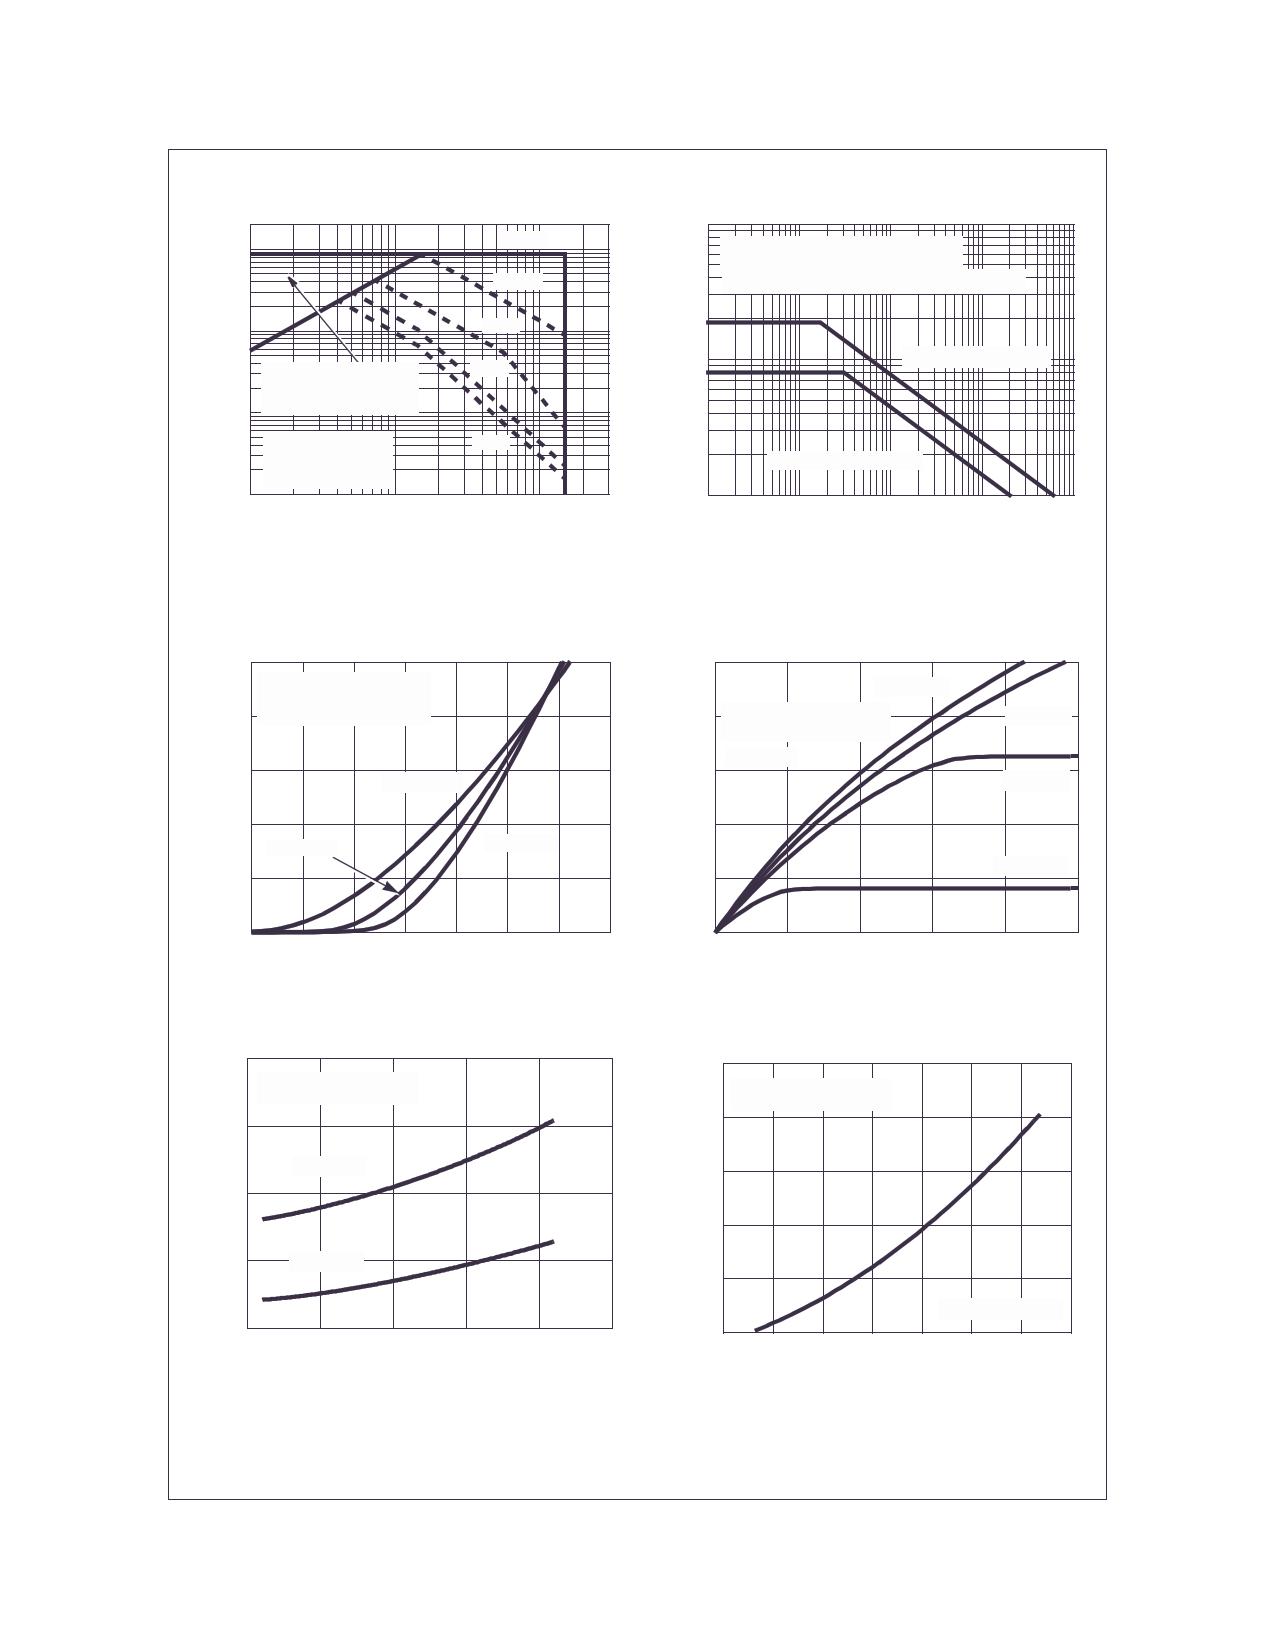 FDD2582 pdf, 반도체, 판매, 대치품